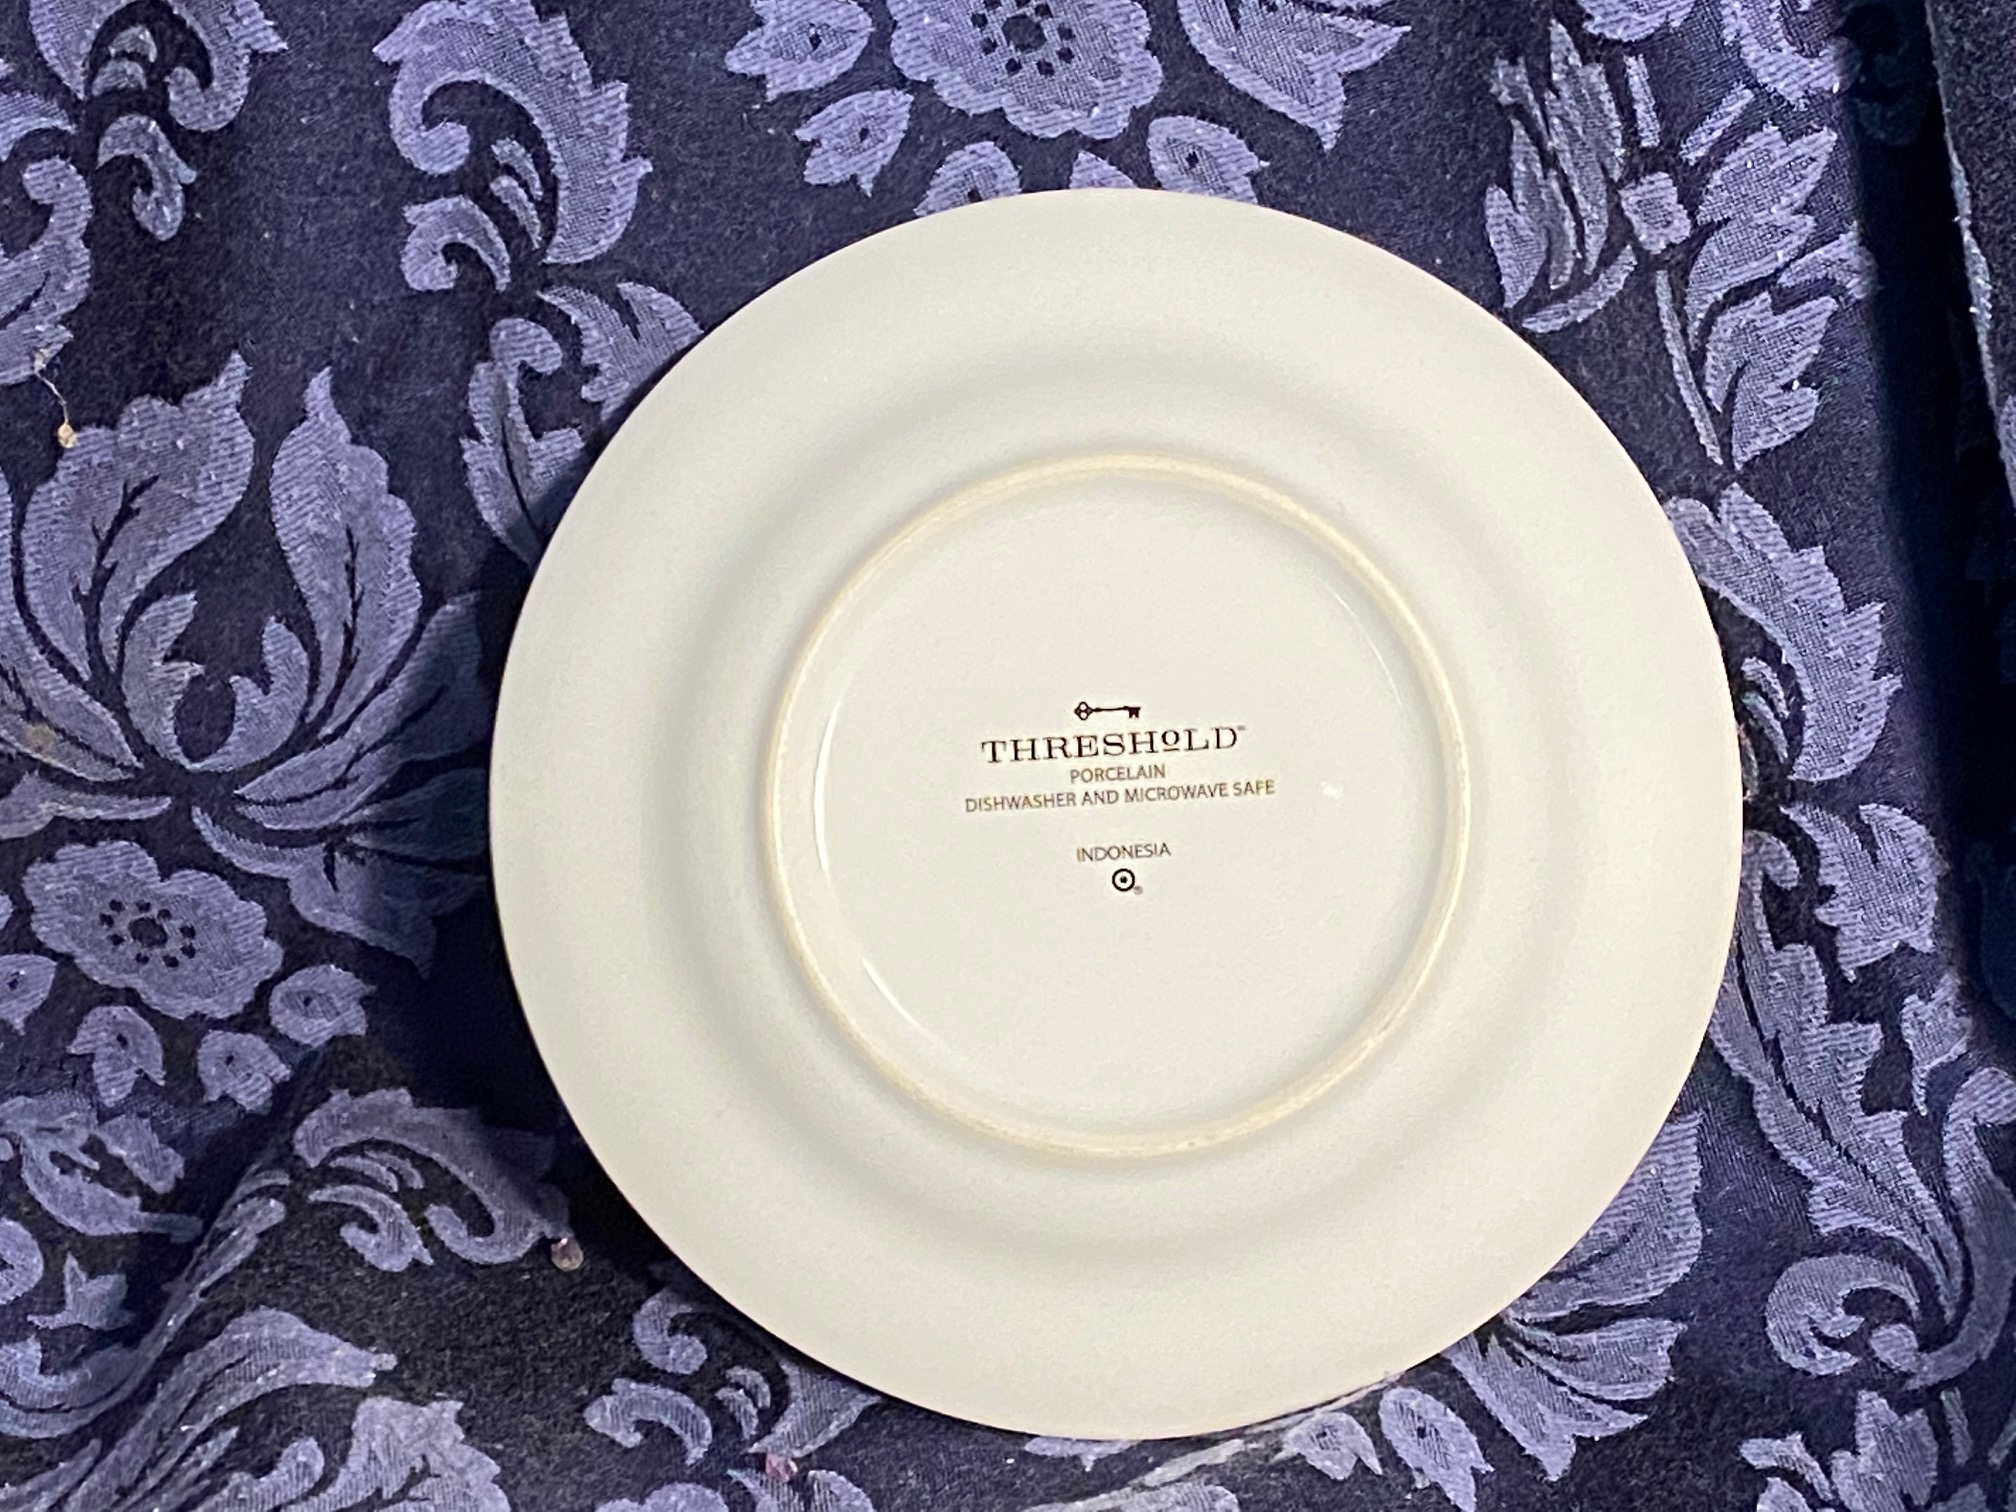 Some good news for a change! Target Threshold porcelain appetizer